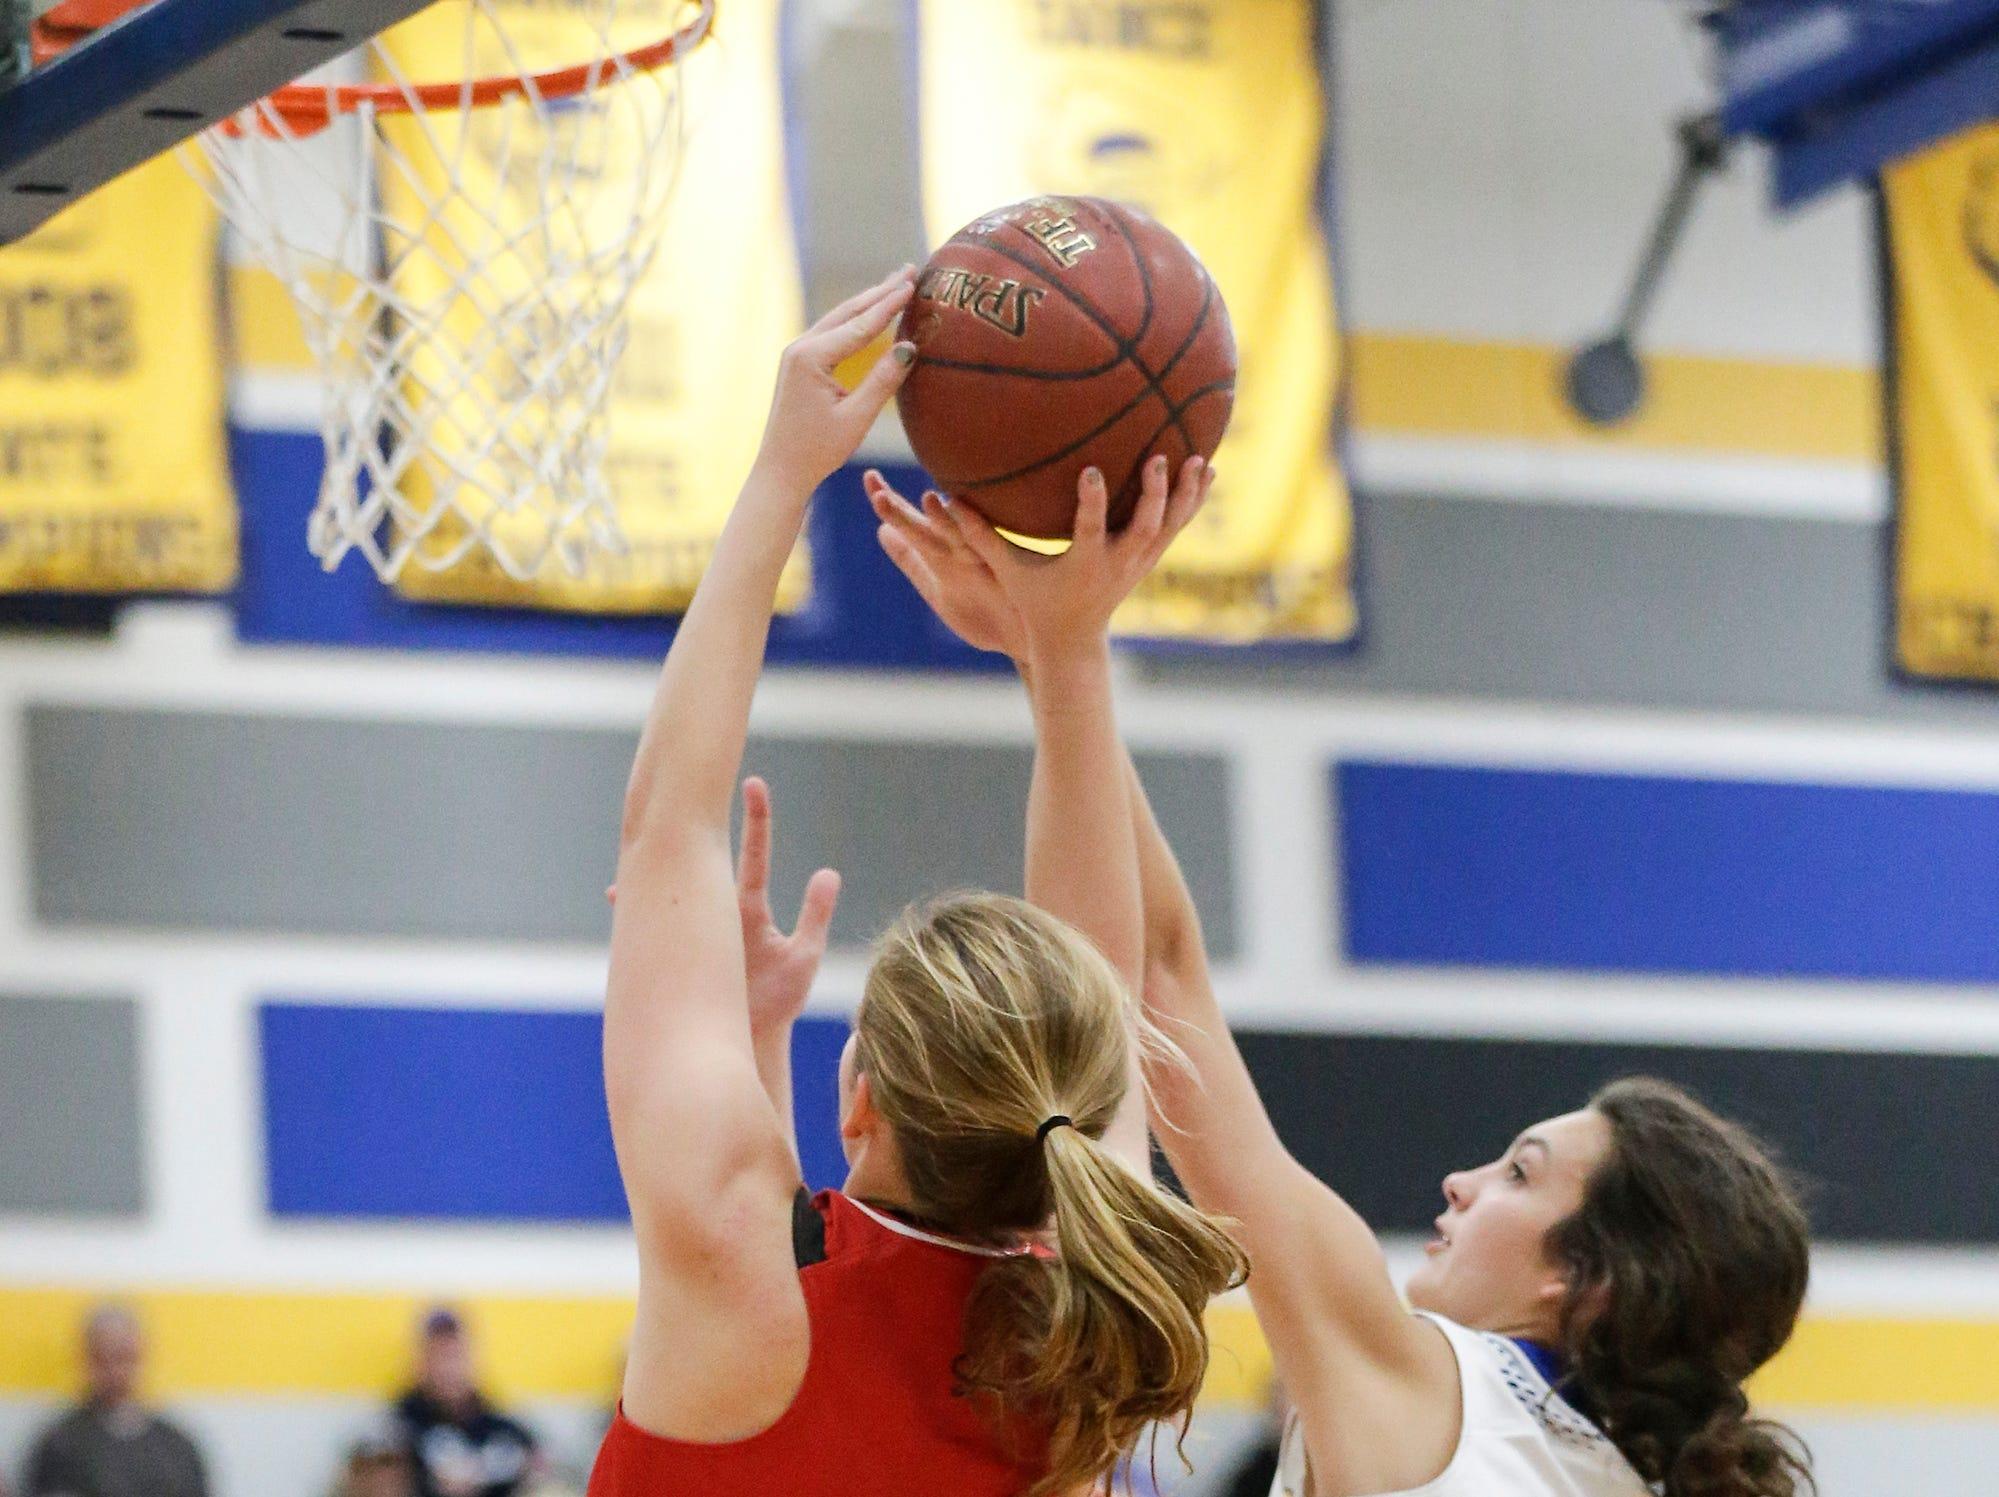 Lomira High School girls basketball's Gabriella Luecke attempts a basket against Campbellsport High School's Madysen Janke during their game Friday, December 28, 2018 in Campbellsport. Doug Raflik/USA TODAY NETWORK-Wisconsin